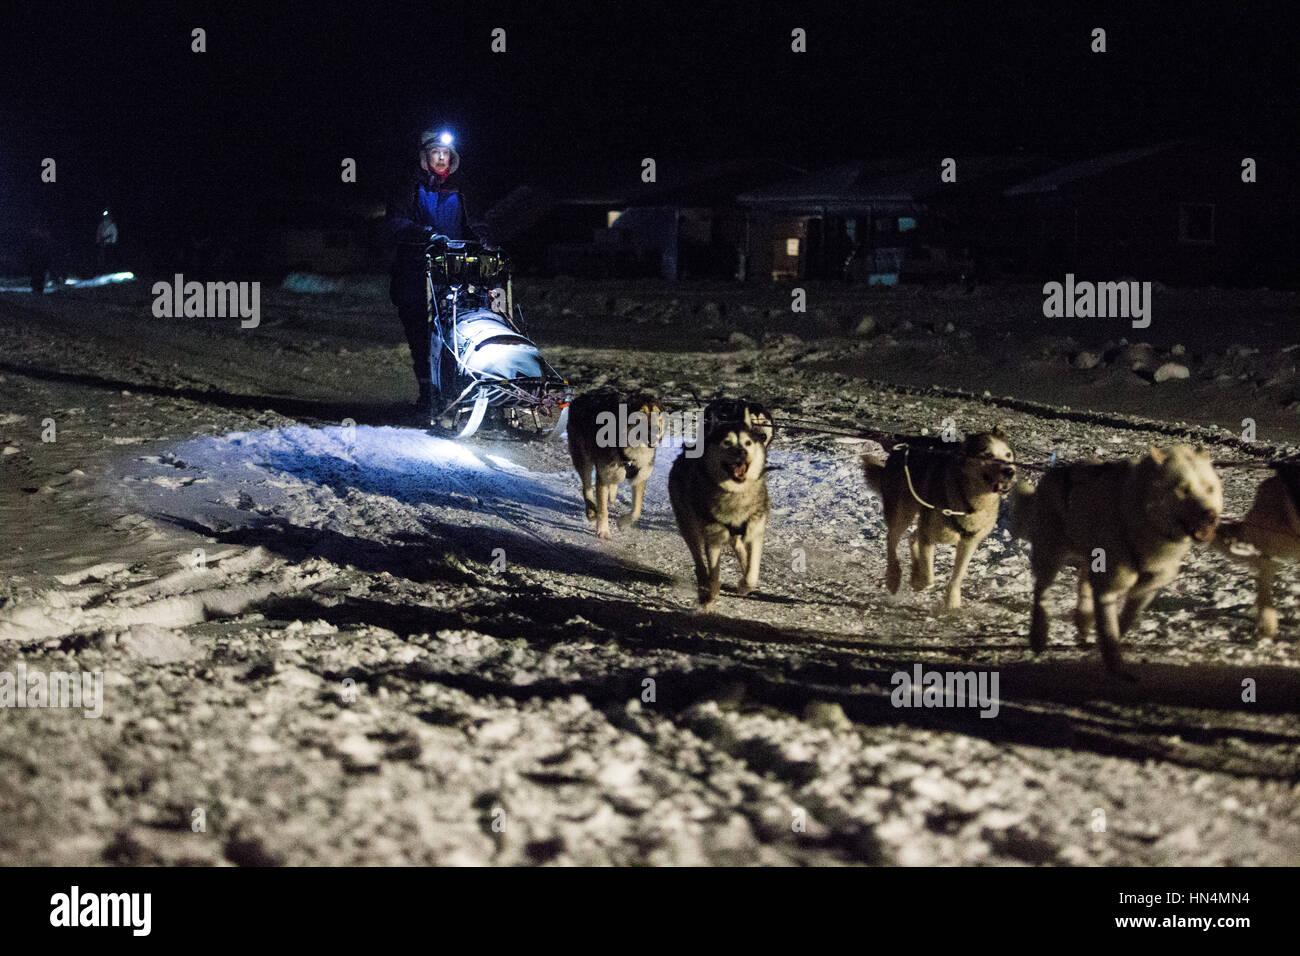 A musher at the start of the 150 Class Race - Nyborgmoen, NORWAY, February 3. 2017 - Bergebyløpet N70 ©Samuel - Stock Image